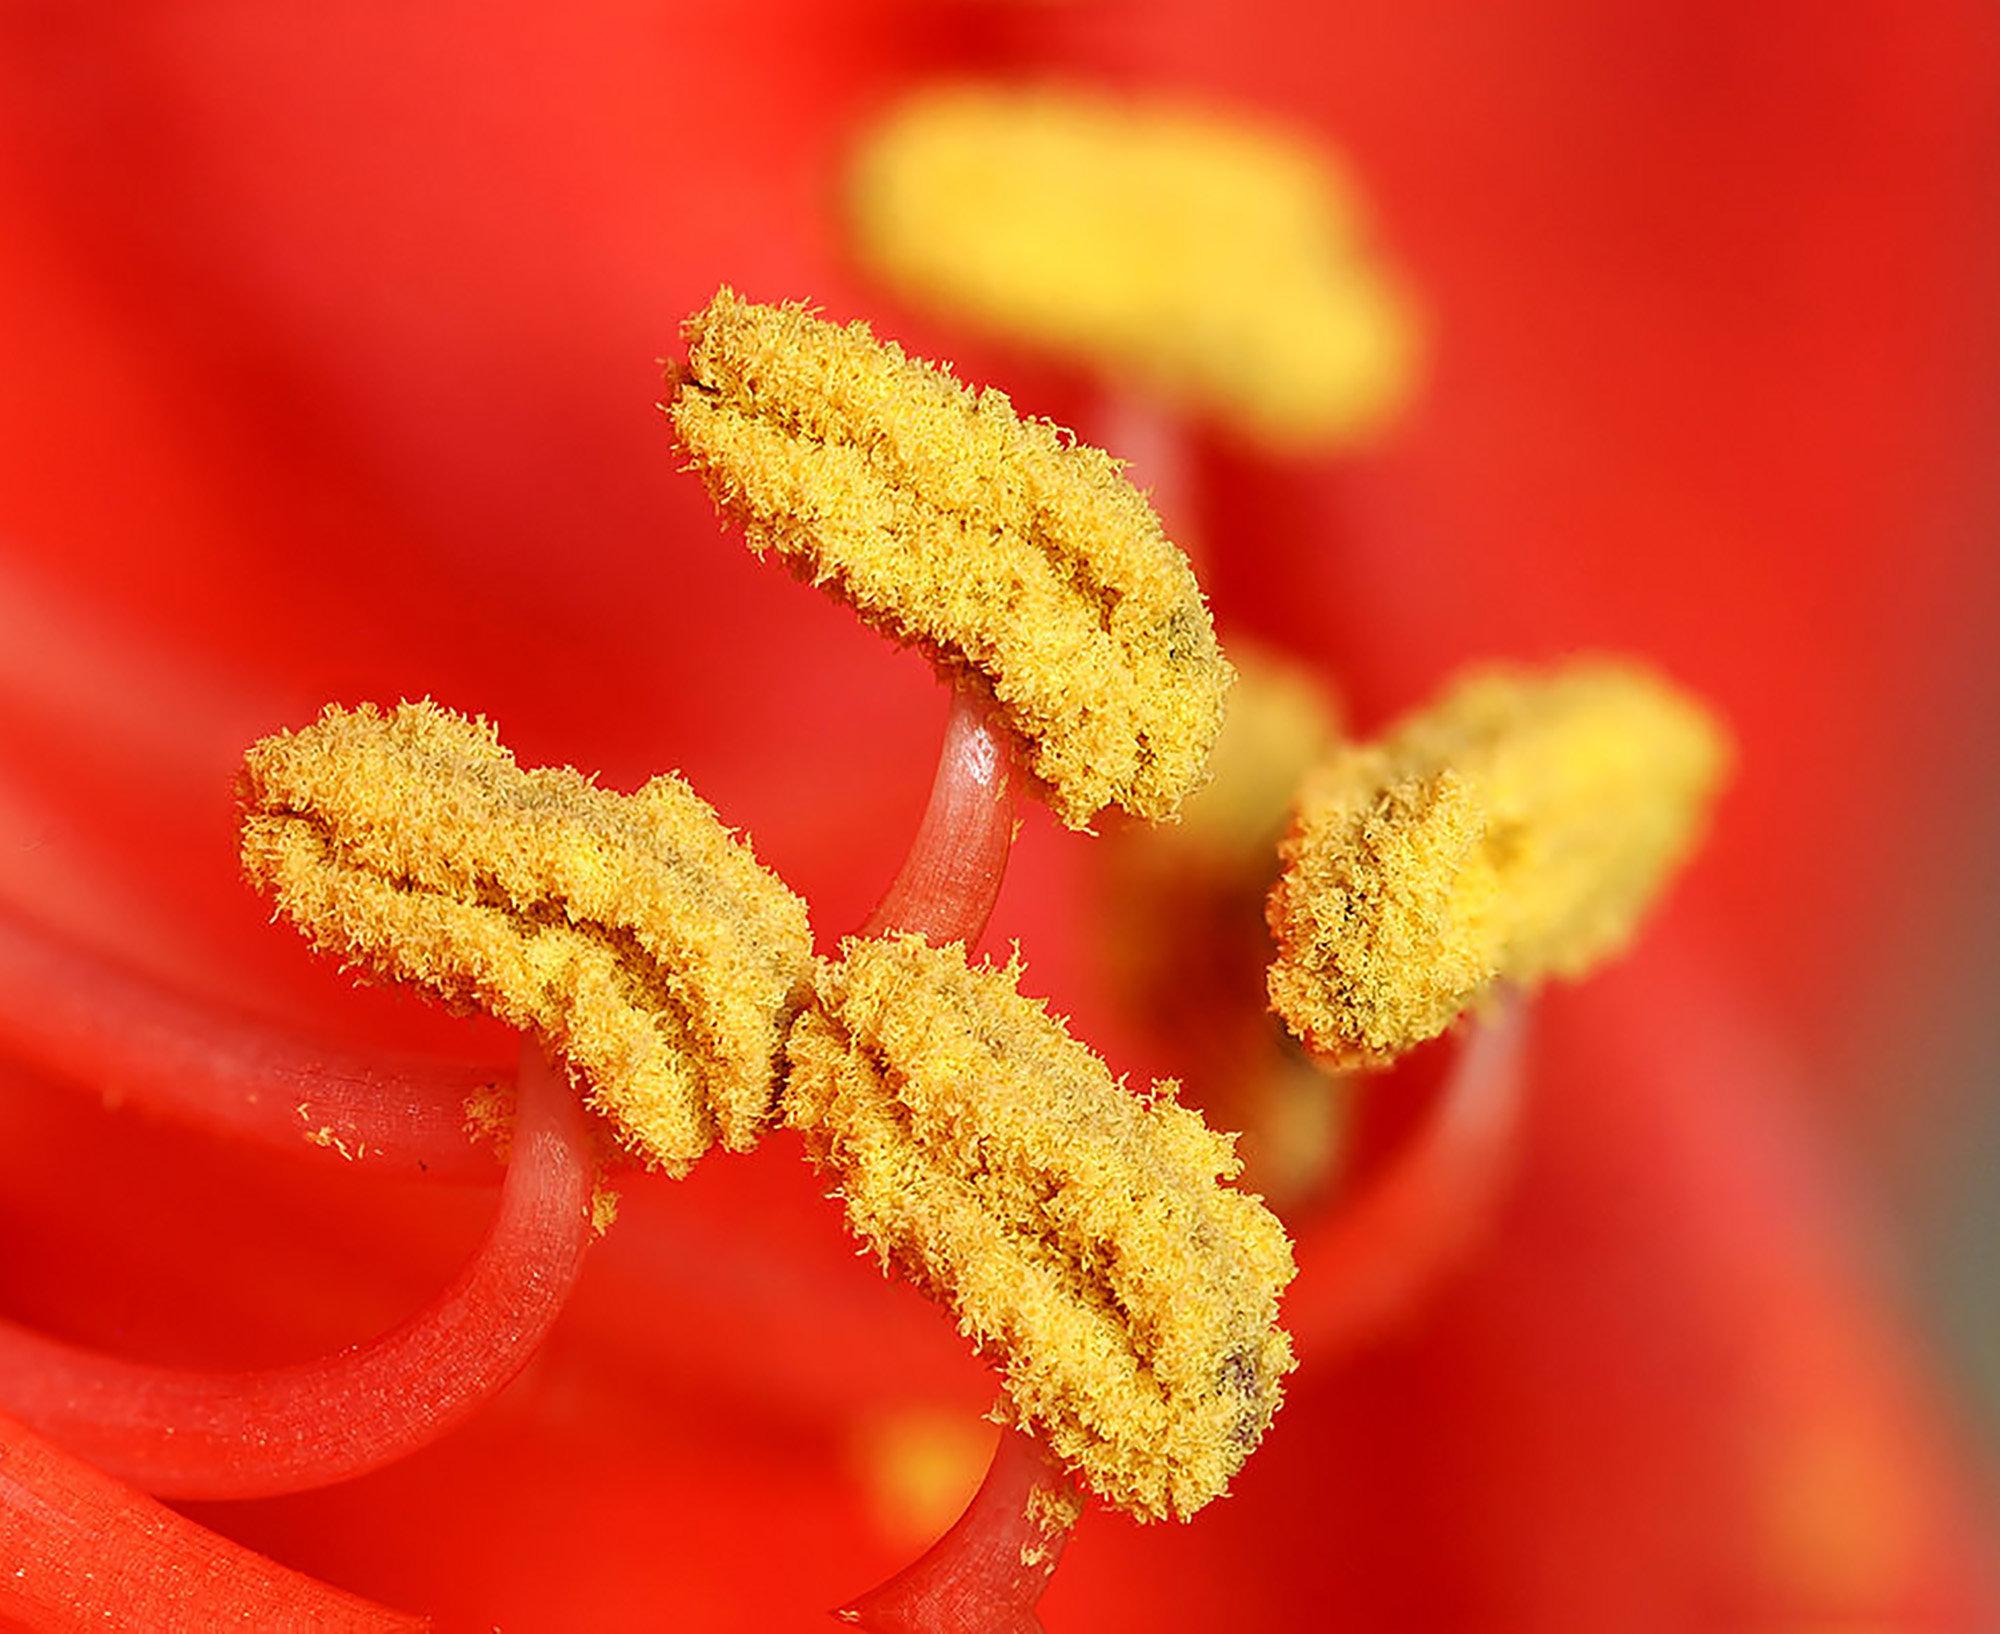 kliar i halsen hosta allergi